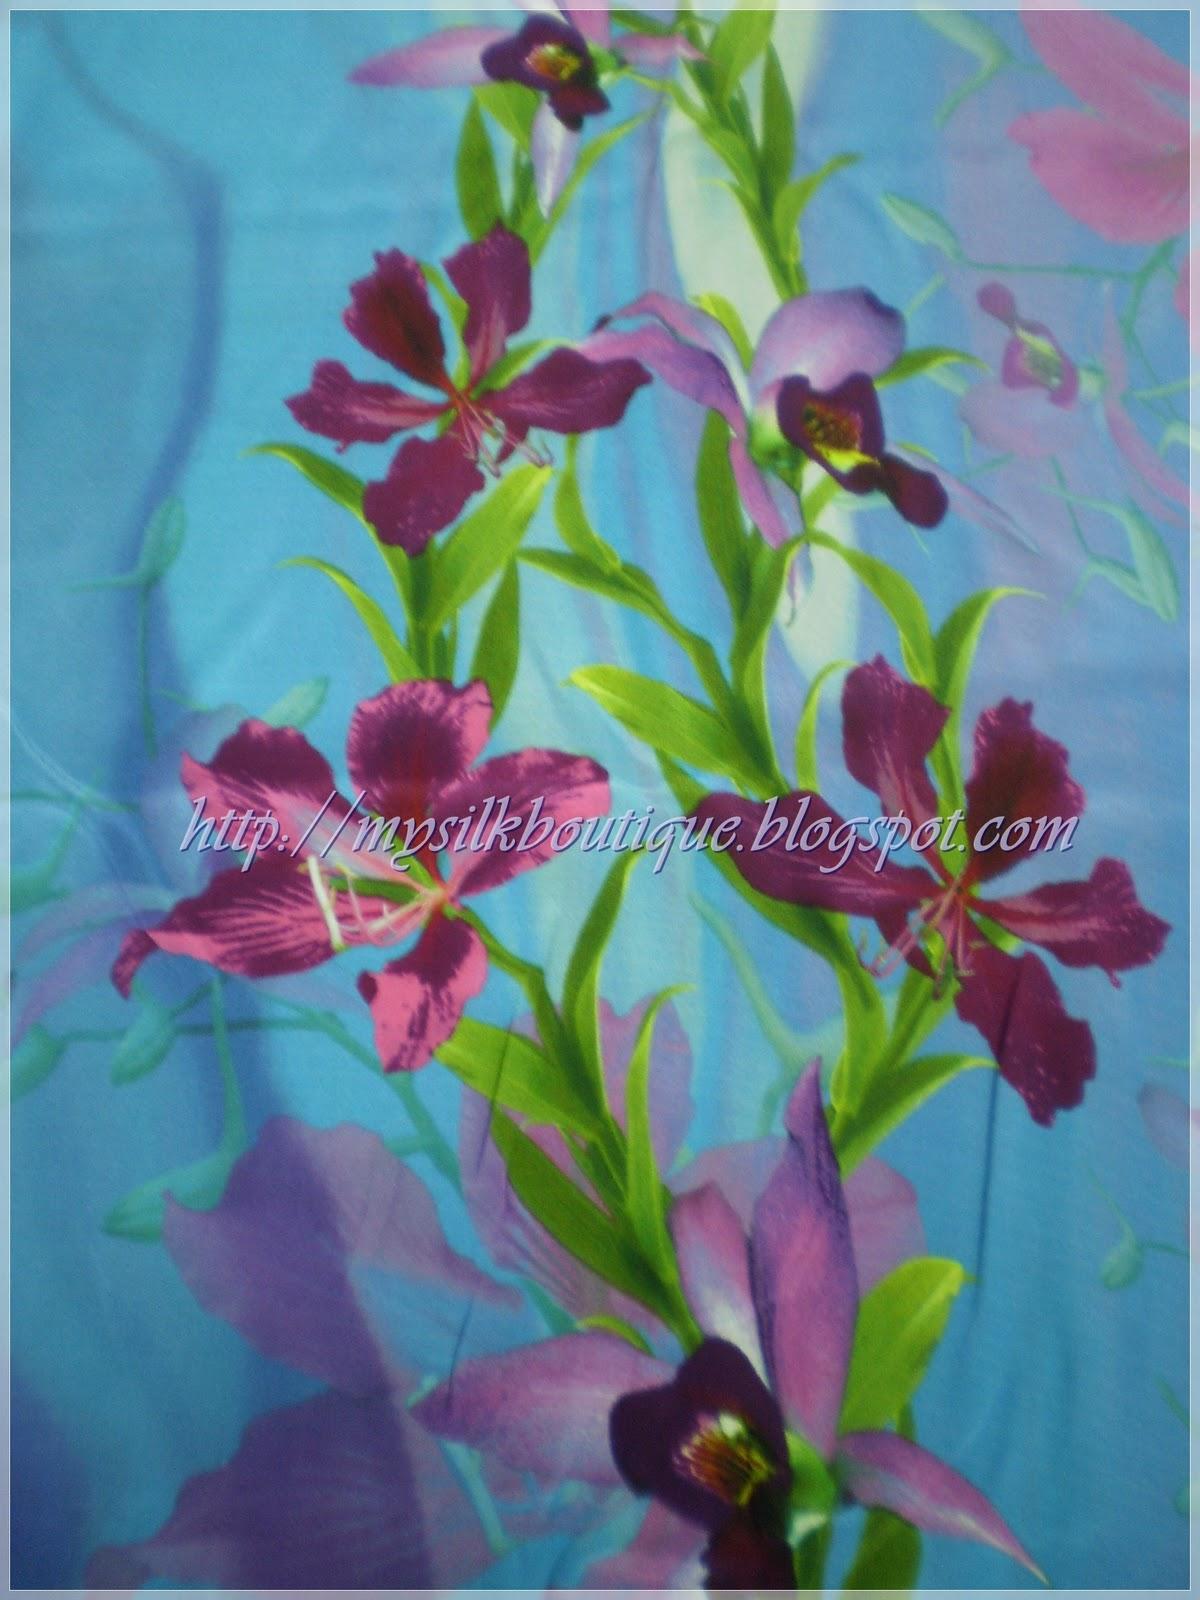 Abstrak Batik Gambar Tato Background Template Ining Search